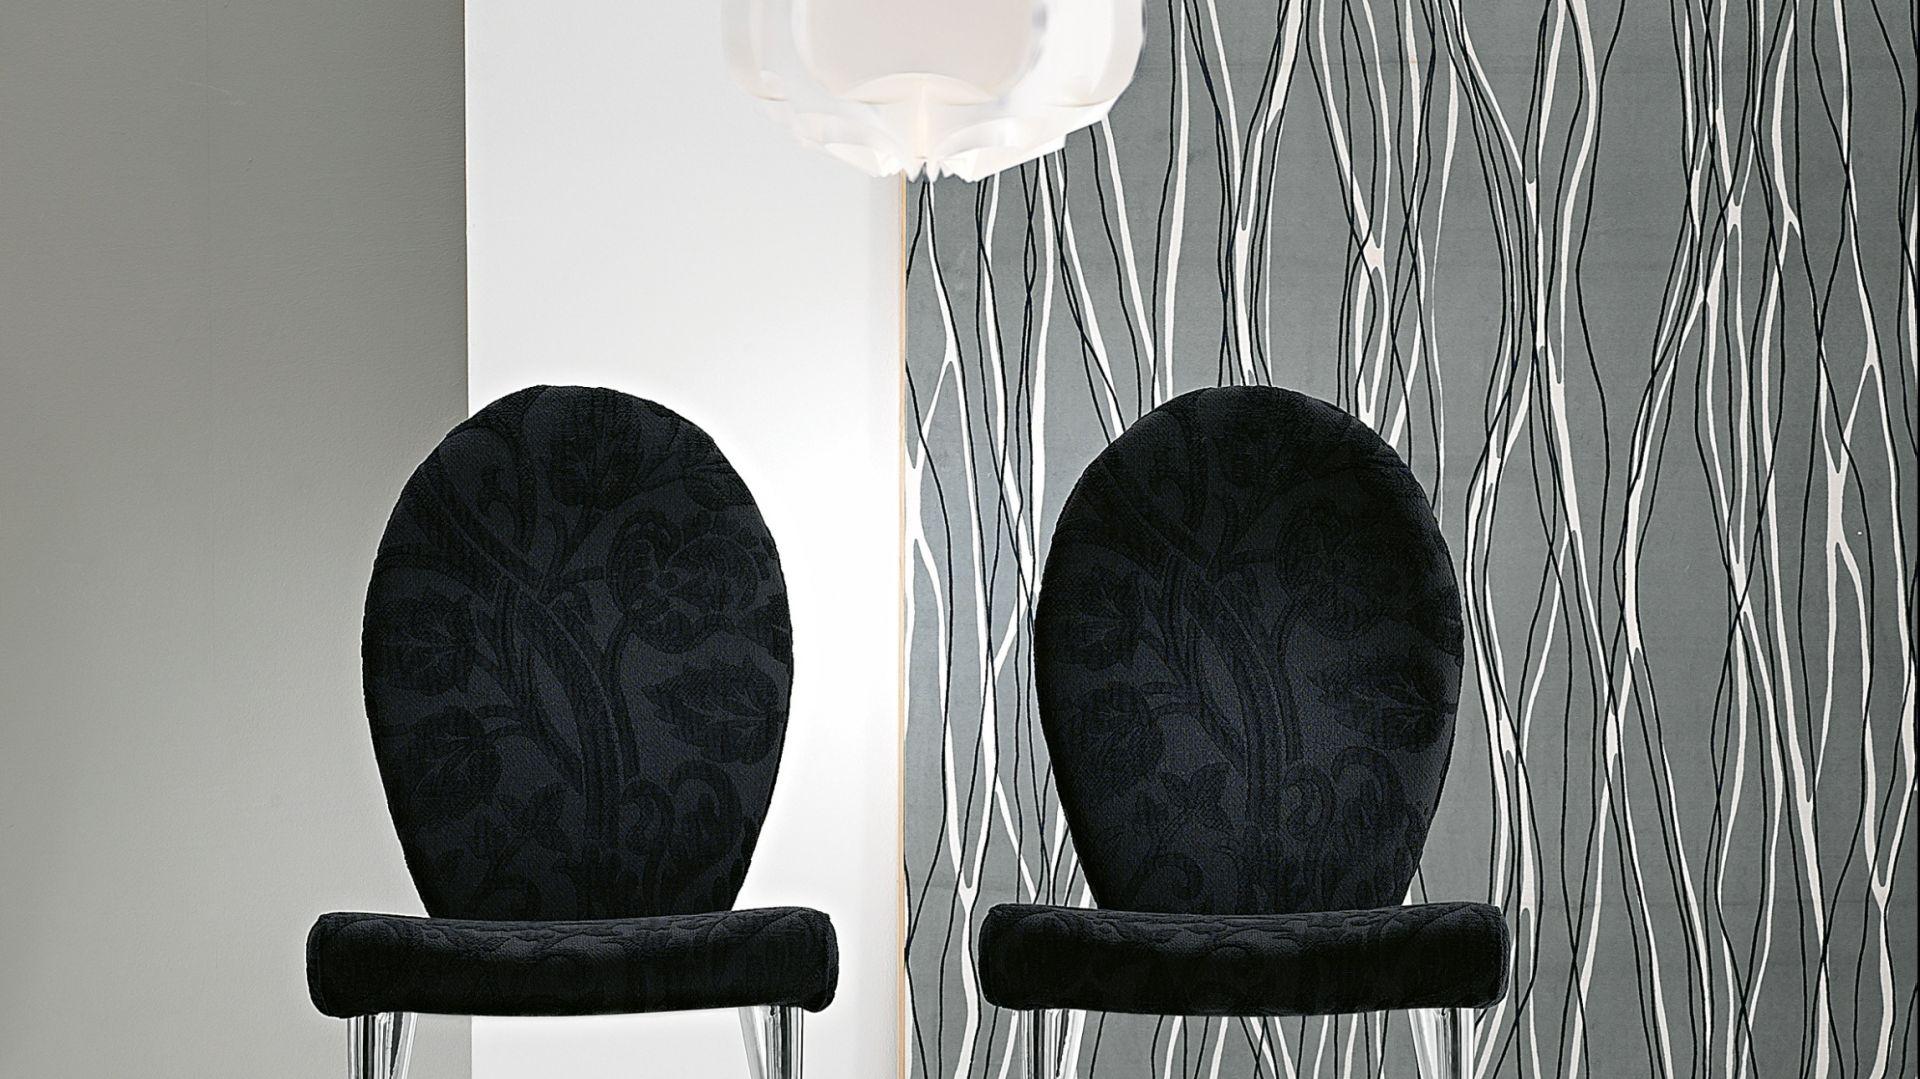 Stylizowane krzesła Ribes. Fot. Bonaldo.